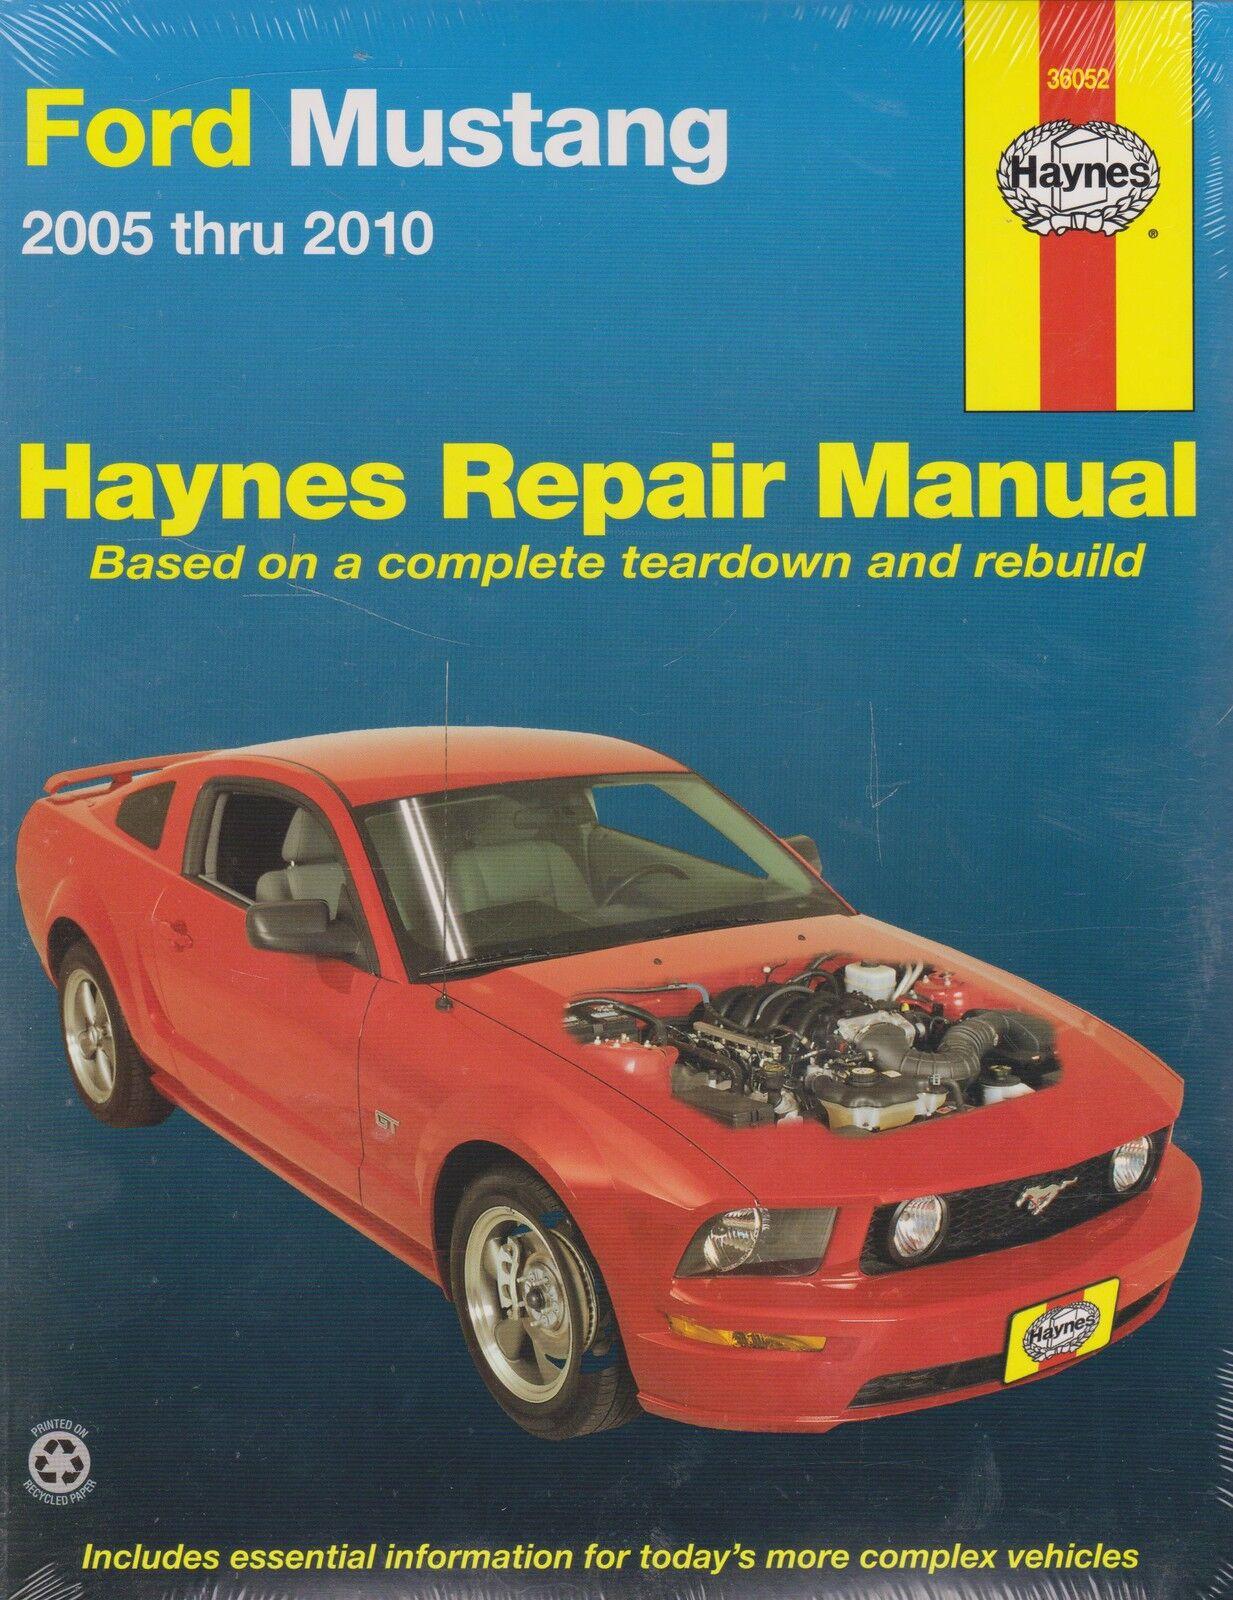 haynes repair manual ford mustang 2005 thru 2010 by inc editors rh ebay com 1994 Ford Mustang 2010 Ford Mustang Manual Transmission